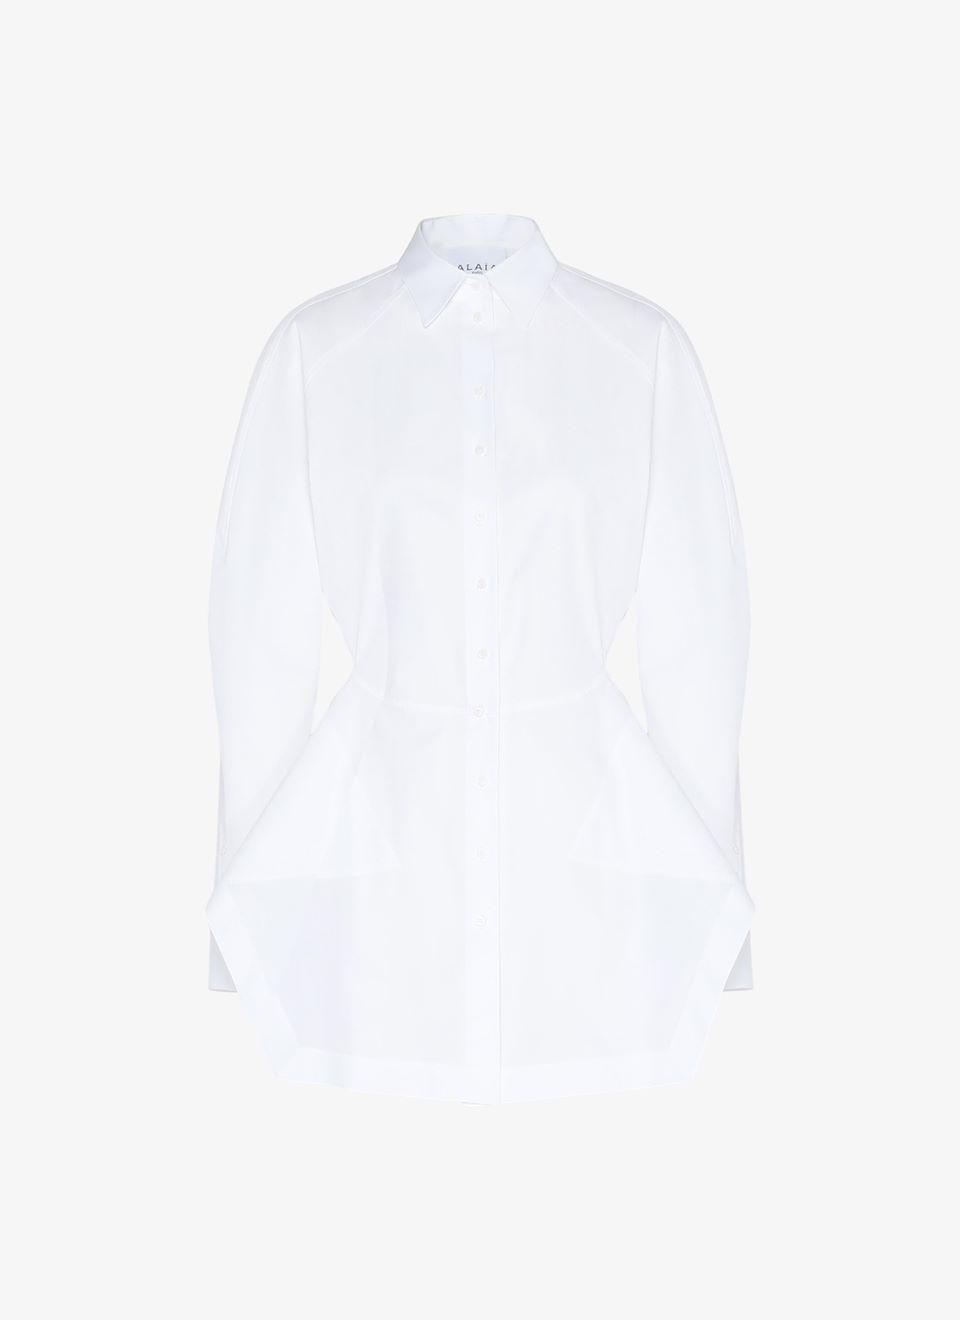 Alaïa Shirt, Size 10, Color White